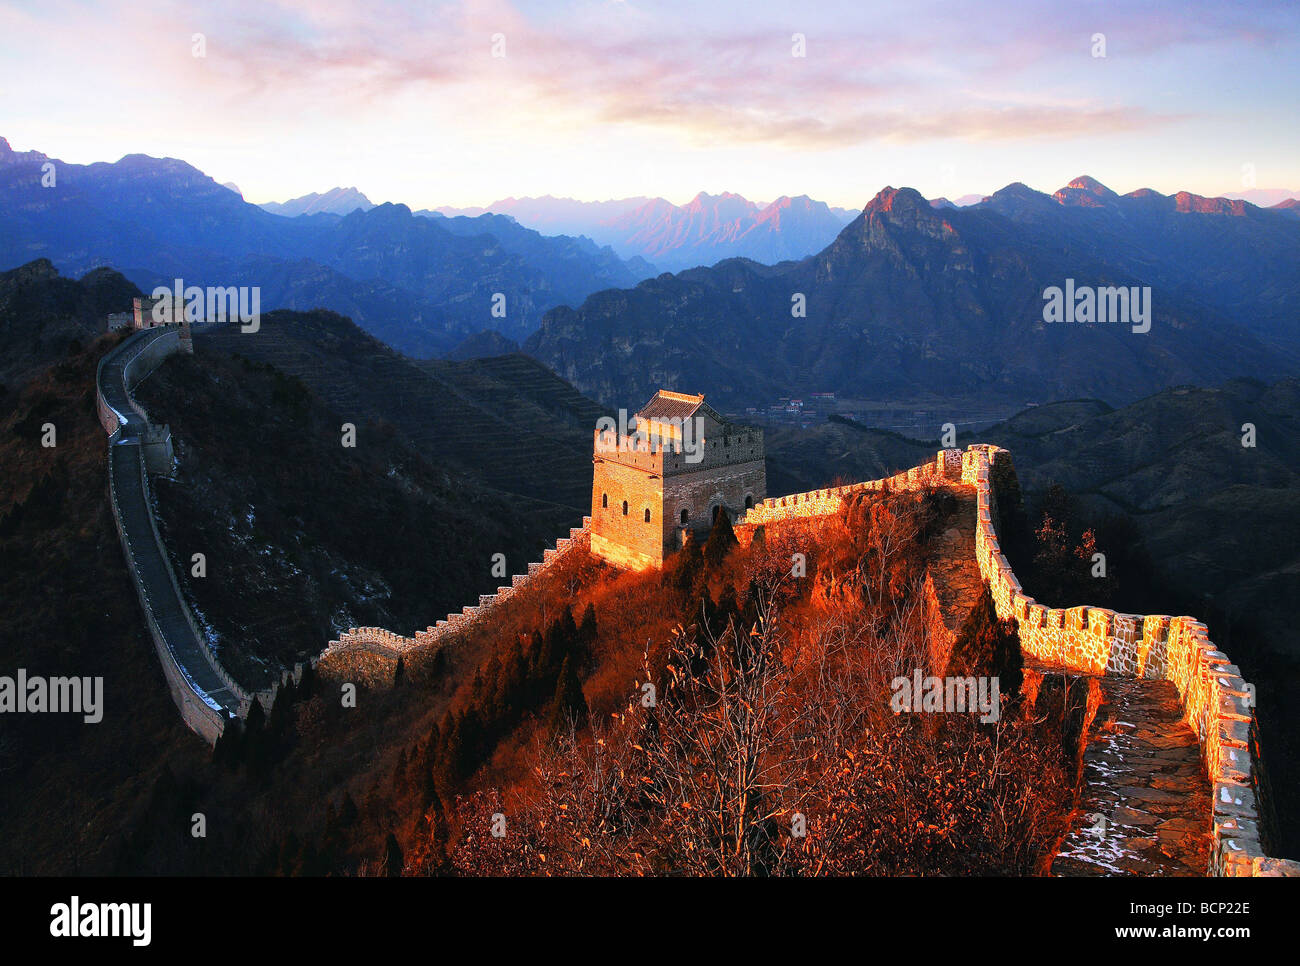 Huangyaguan Grande Muro avvolgimento attraverso la montagna, Contea di Ji, Tianjin, Cina Immagini Stock